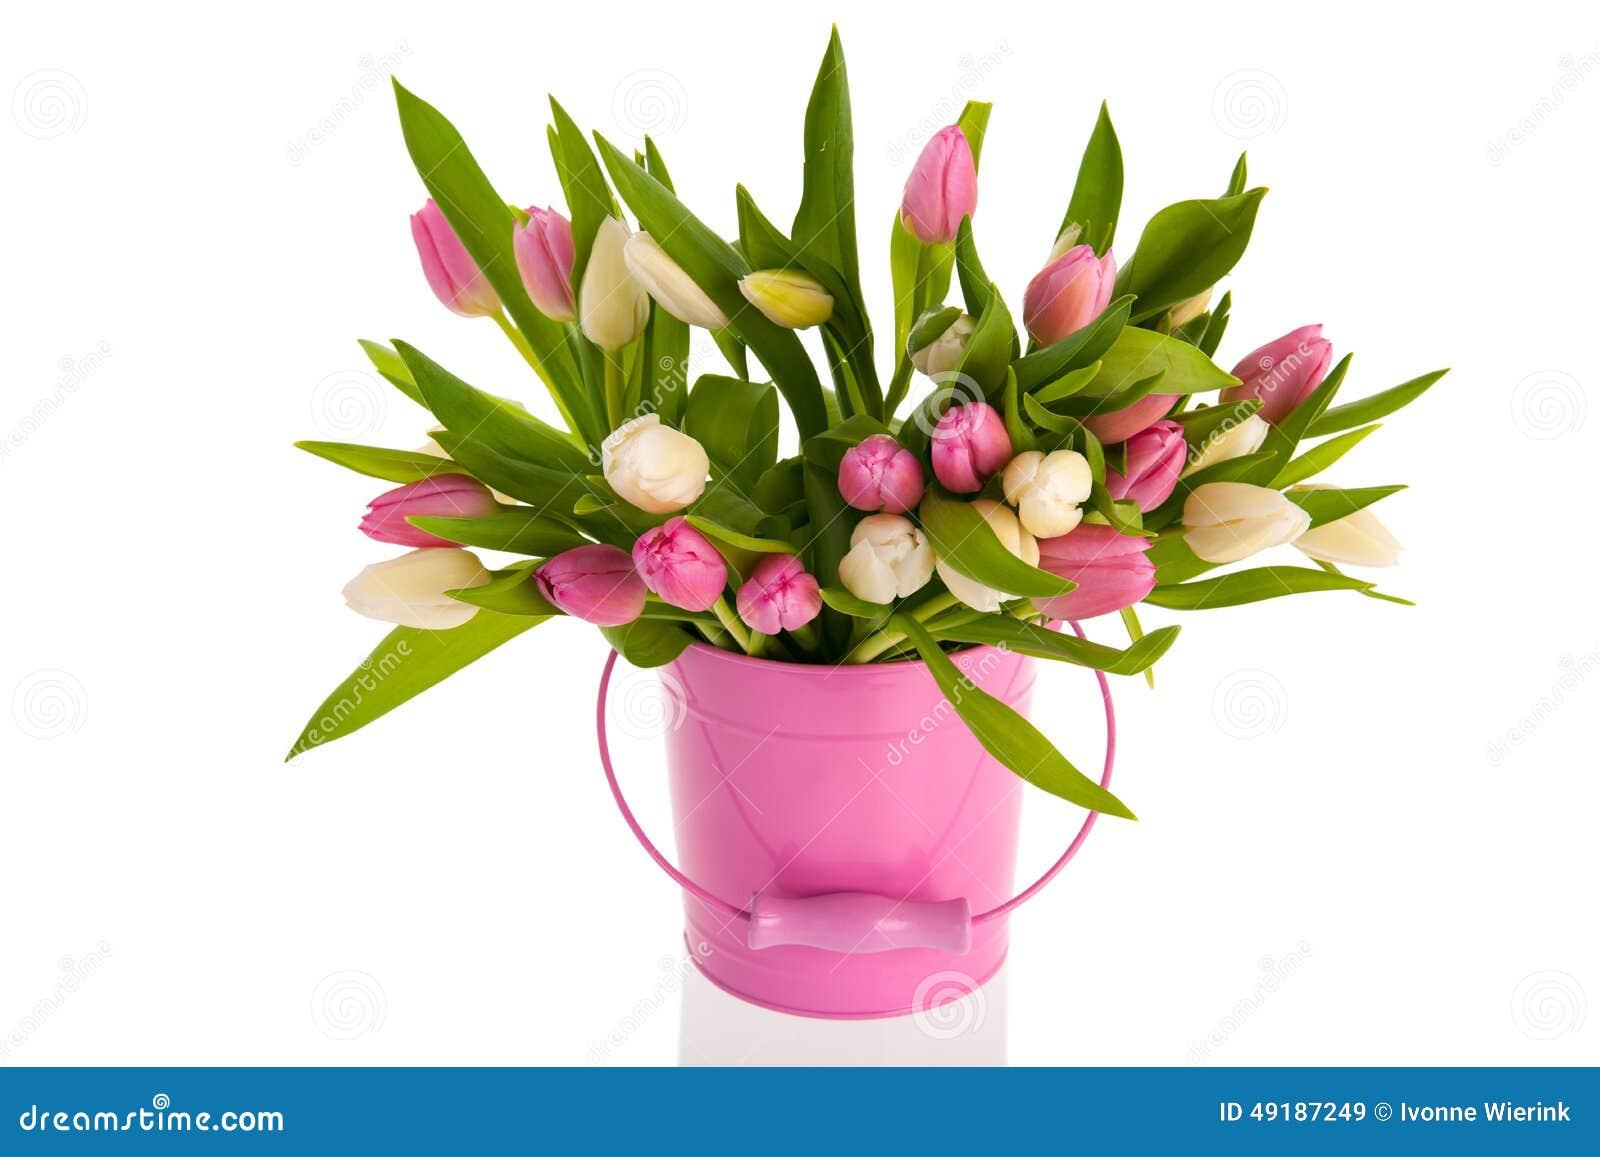 rosa und wei e tulpen im eimer stockfoto bild 49187249. Black Bedroom Furniture Sets. Home Design Ideas